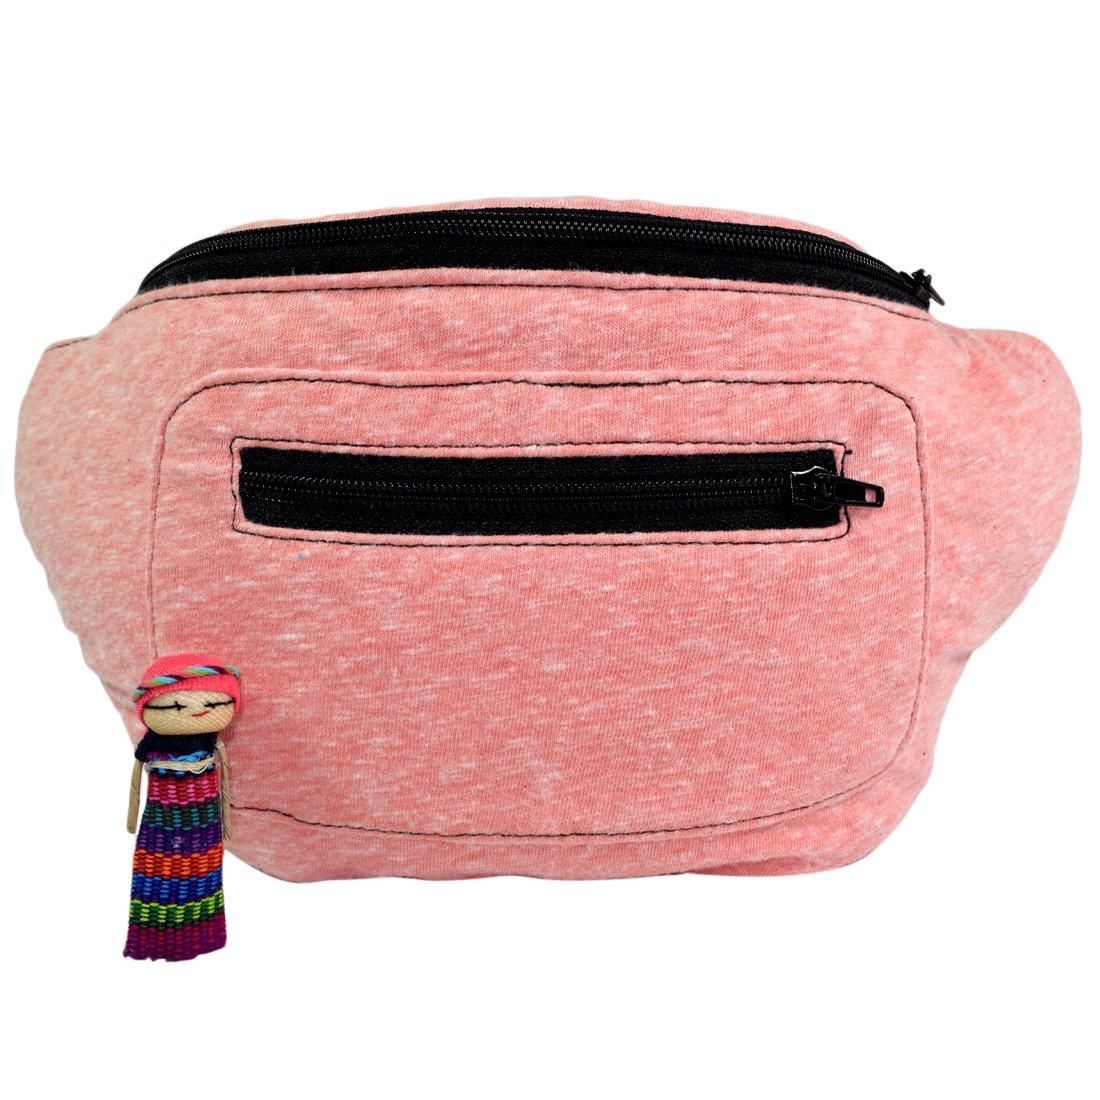 Bright Fanny Pack, Stylish Party Boho Chic Handmade with Hidden Pocket